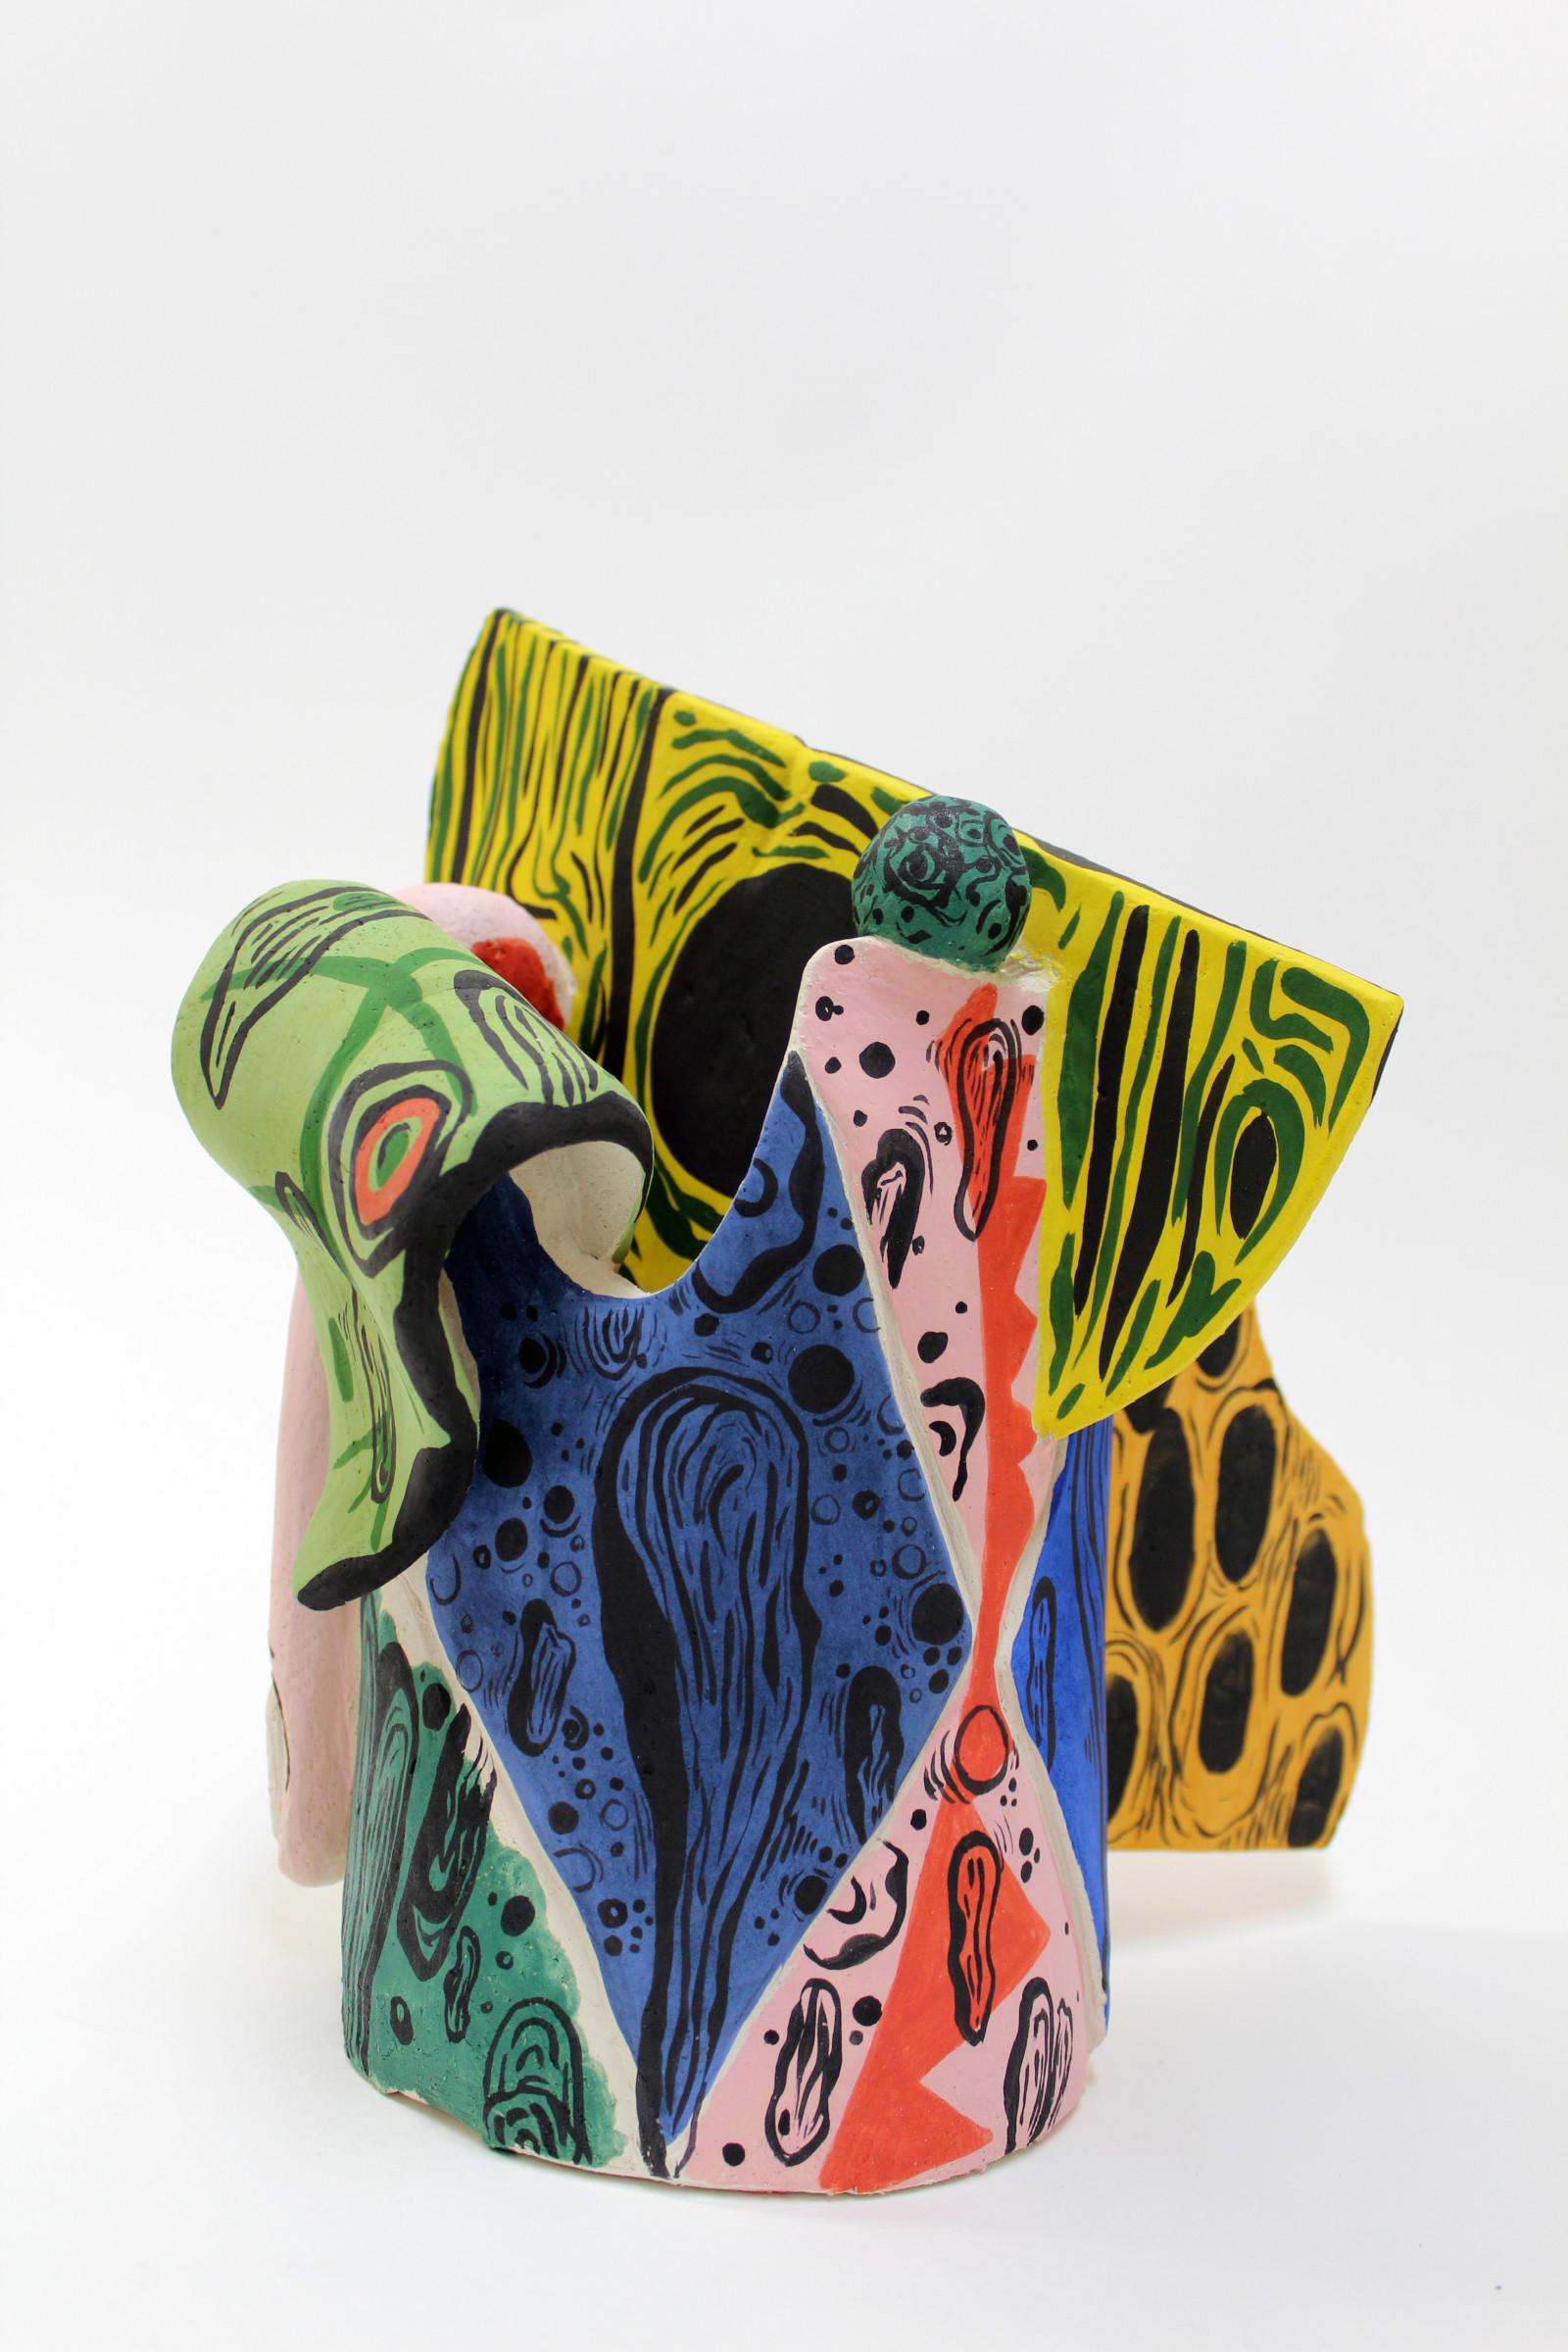 <span class=&#34;link fancybox-details-link&#34;><a href=&#34;/artists/51-florentine-%26-alexandre-lamarche-ovize/works/9566/&#34;>View Detail Page</a></span><div class=&#34;artist&#34;><strong>Florentine & Alexandre LAMARCHE-OVIZE</strong></div> <div class=&#34;title&#34;><em>Barbodoigts</em>, 2018</div> <div class=&#34;medium&#34;>Engobed ceramic</div> <div class=&#34;dimensions&#34;>35 x 20 x 20 cm<br /> 13 3/4 x 7 7/8 x 7 7/8 in</div><div class=&#34;copyright_line&#34;>Copyright The Artist</div>